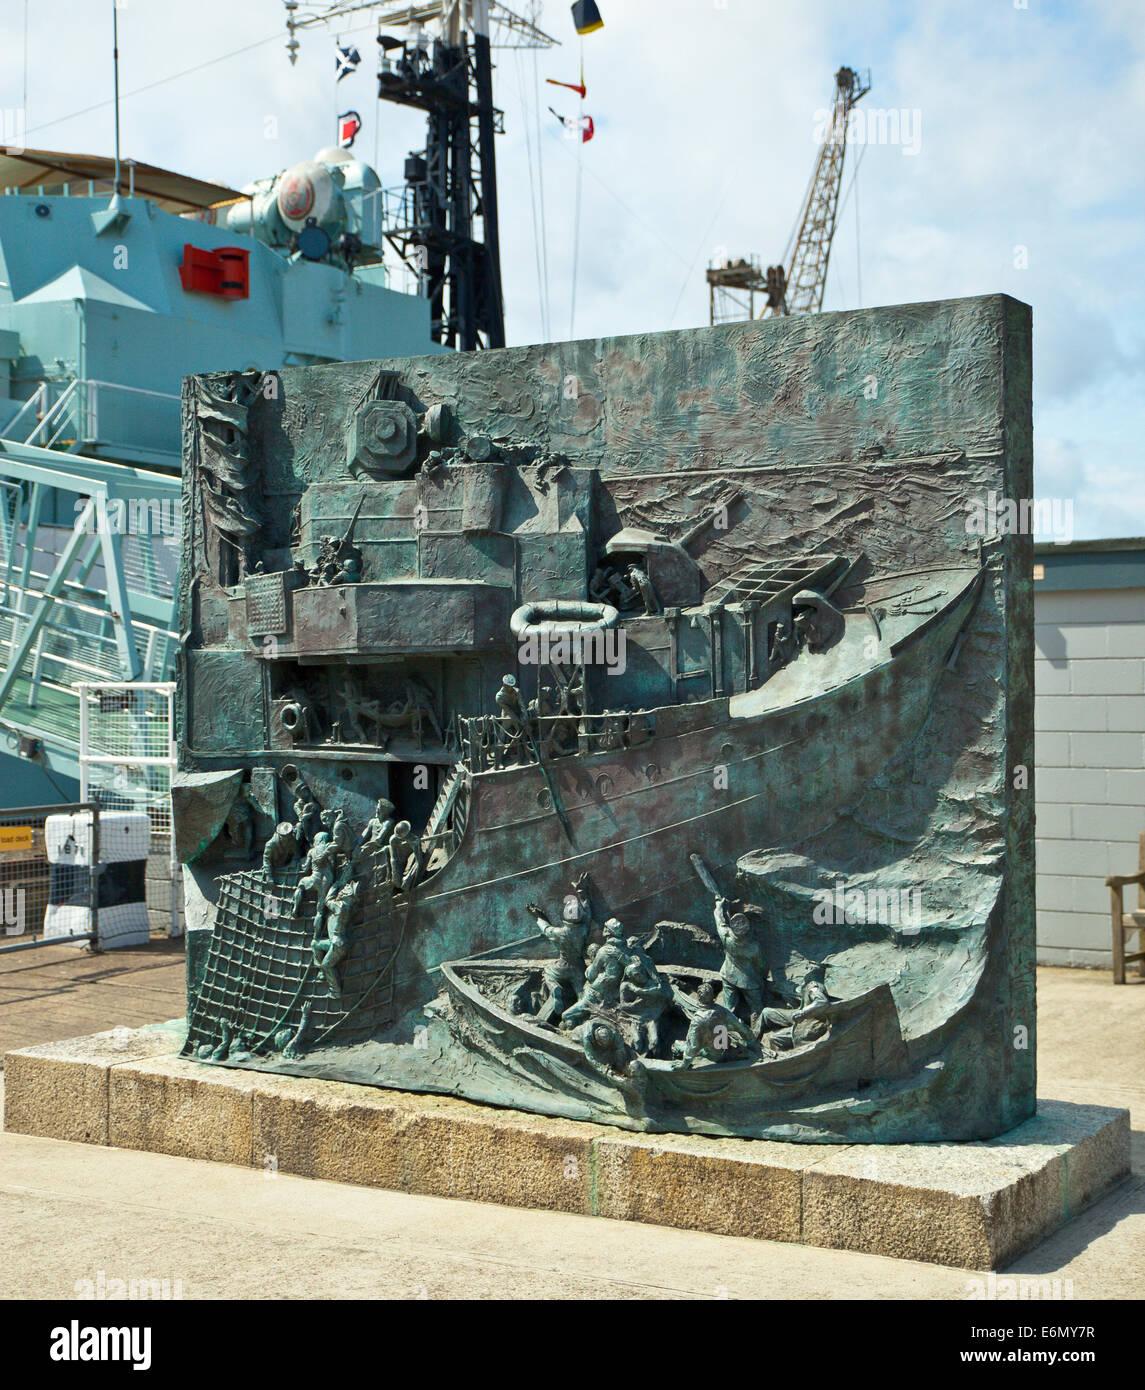 The Destroyer Memorial, Chatham Historic Dockyard. - Stock Image